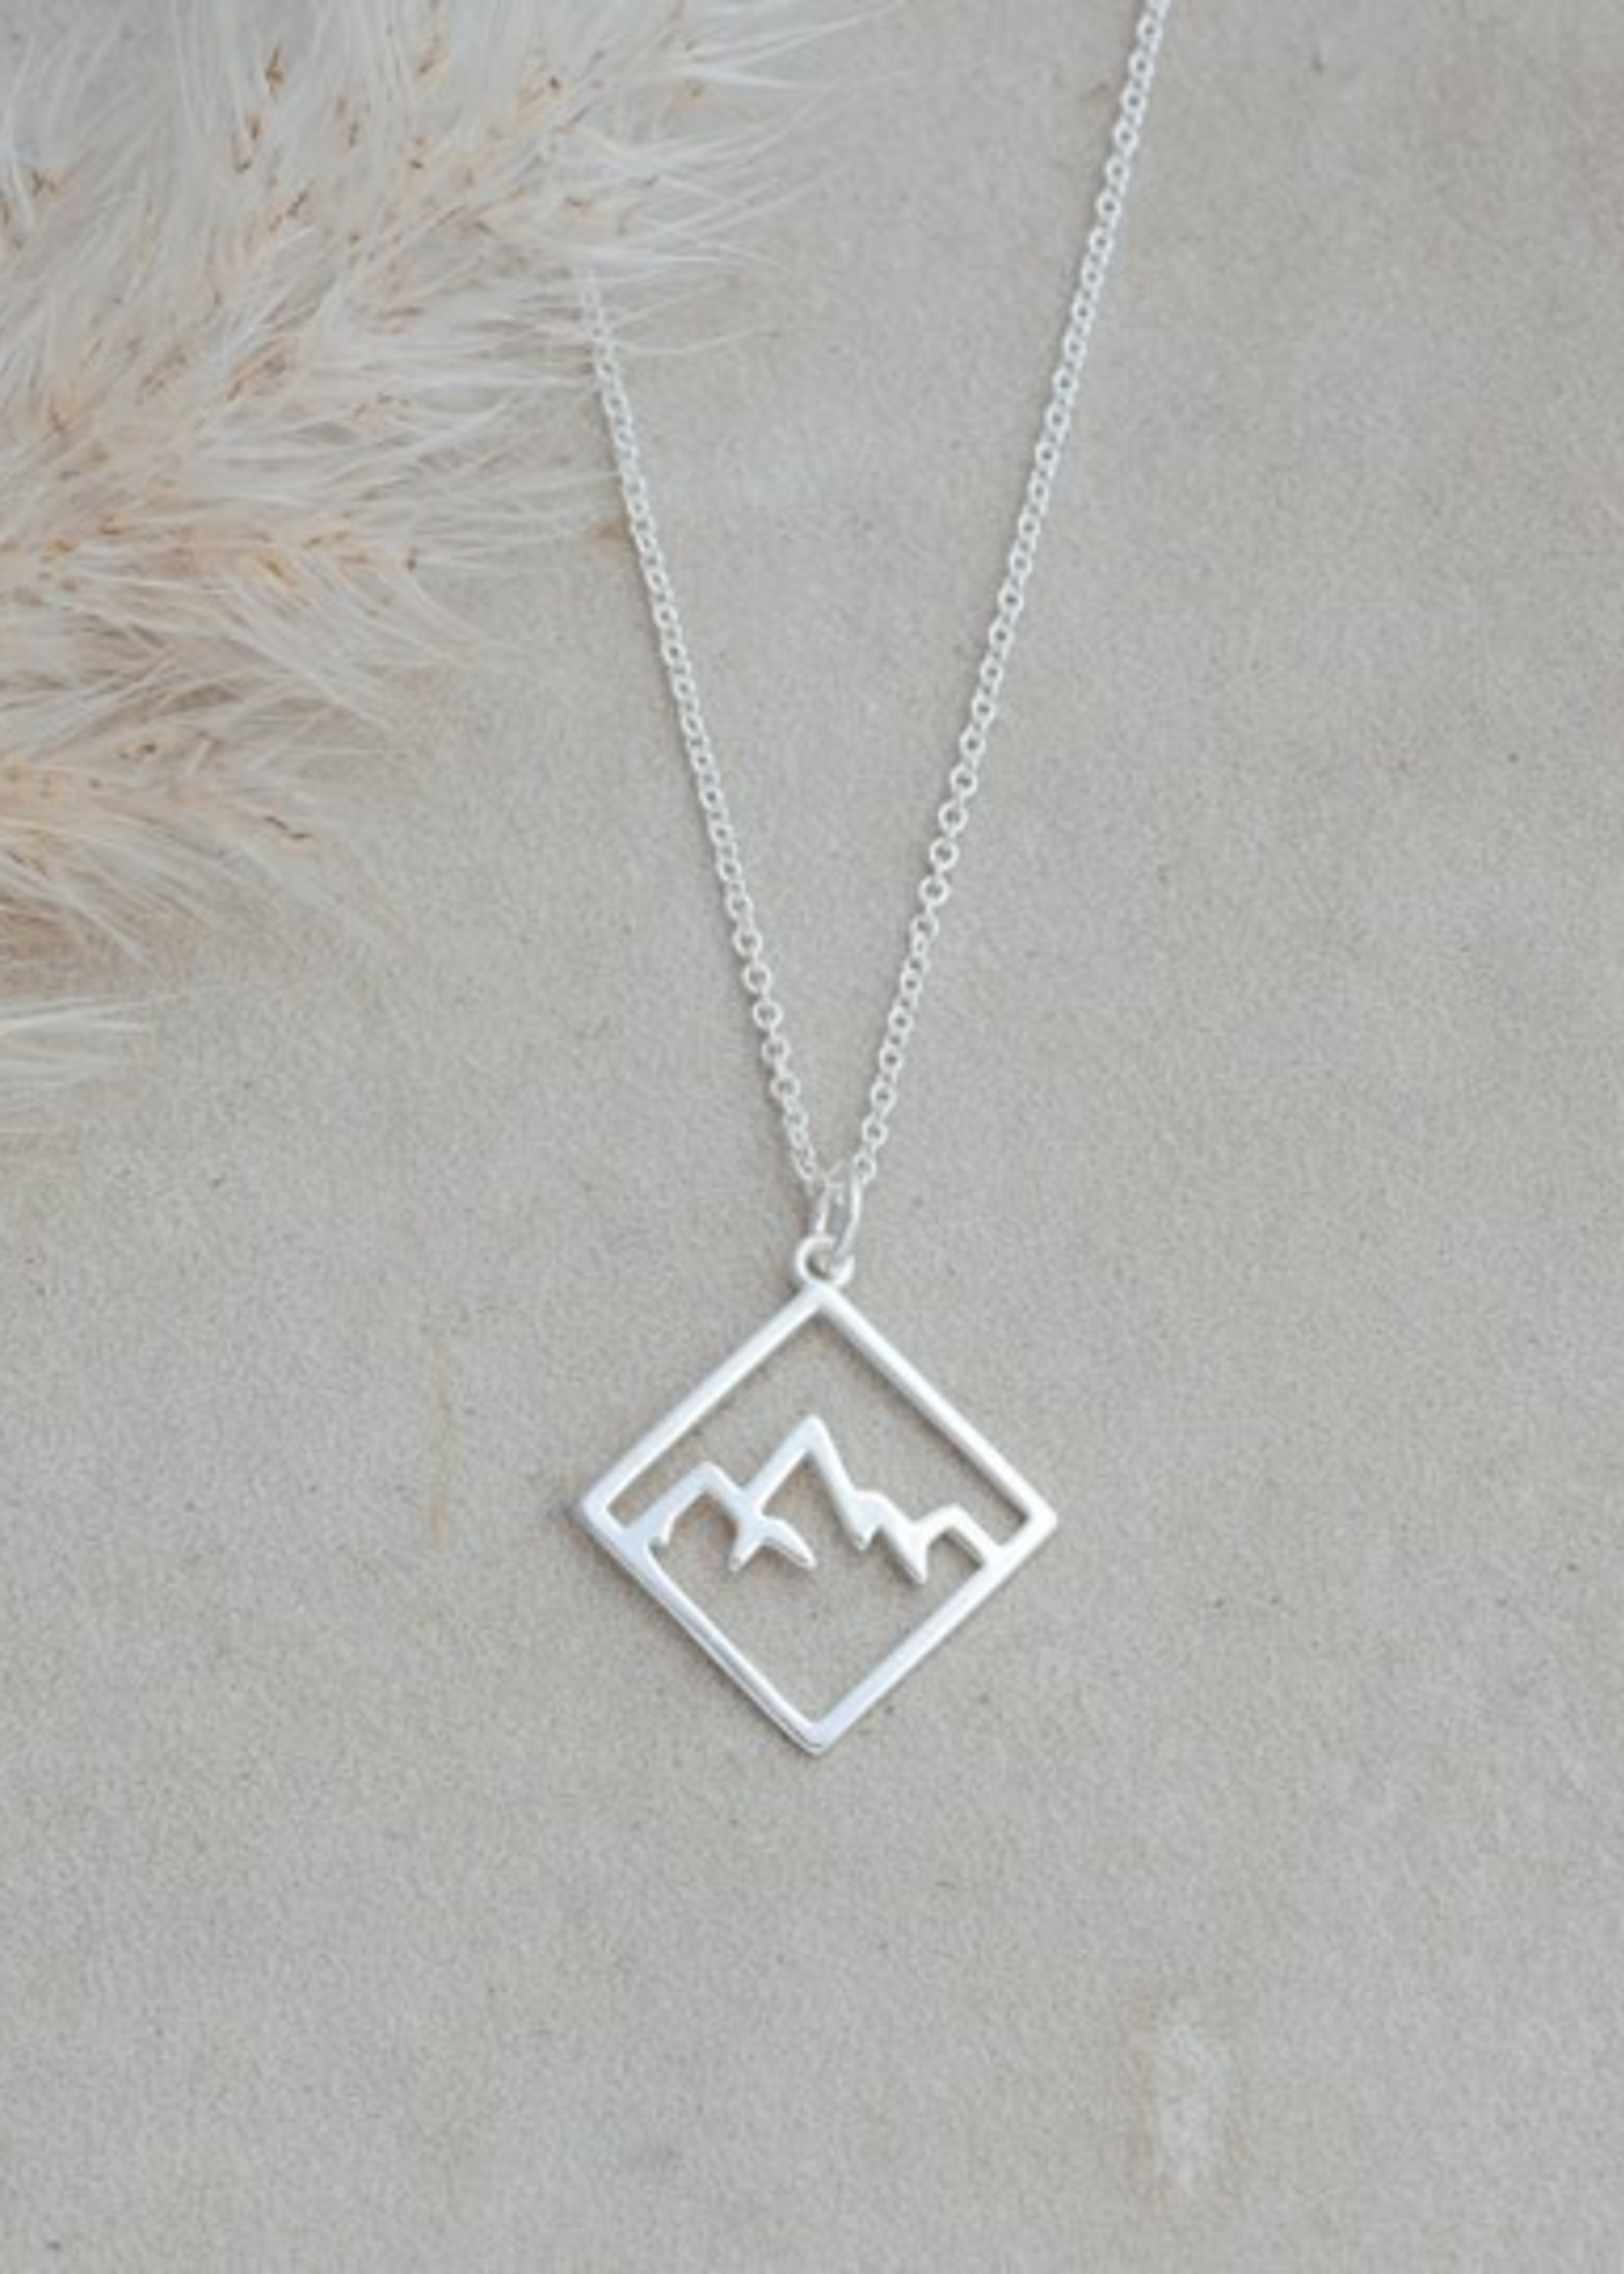 Glee Jewelry Ridge Necklace Silver